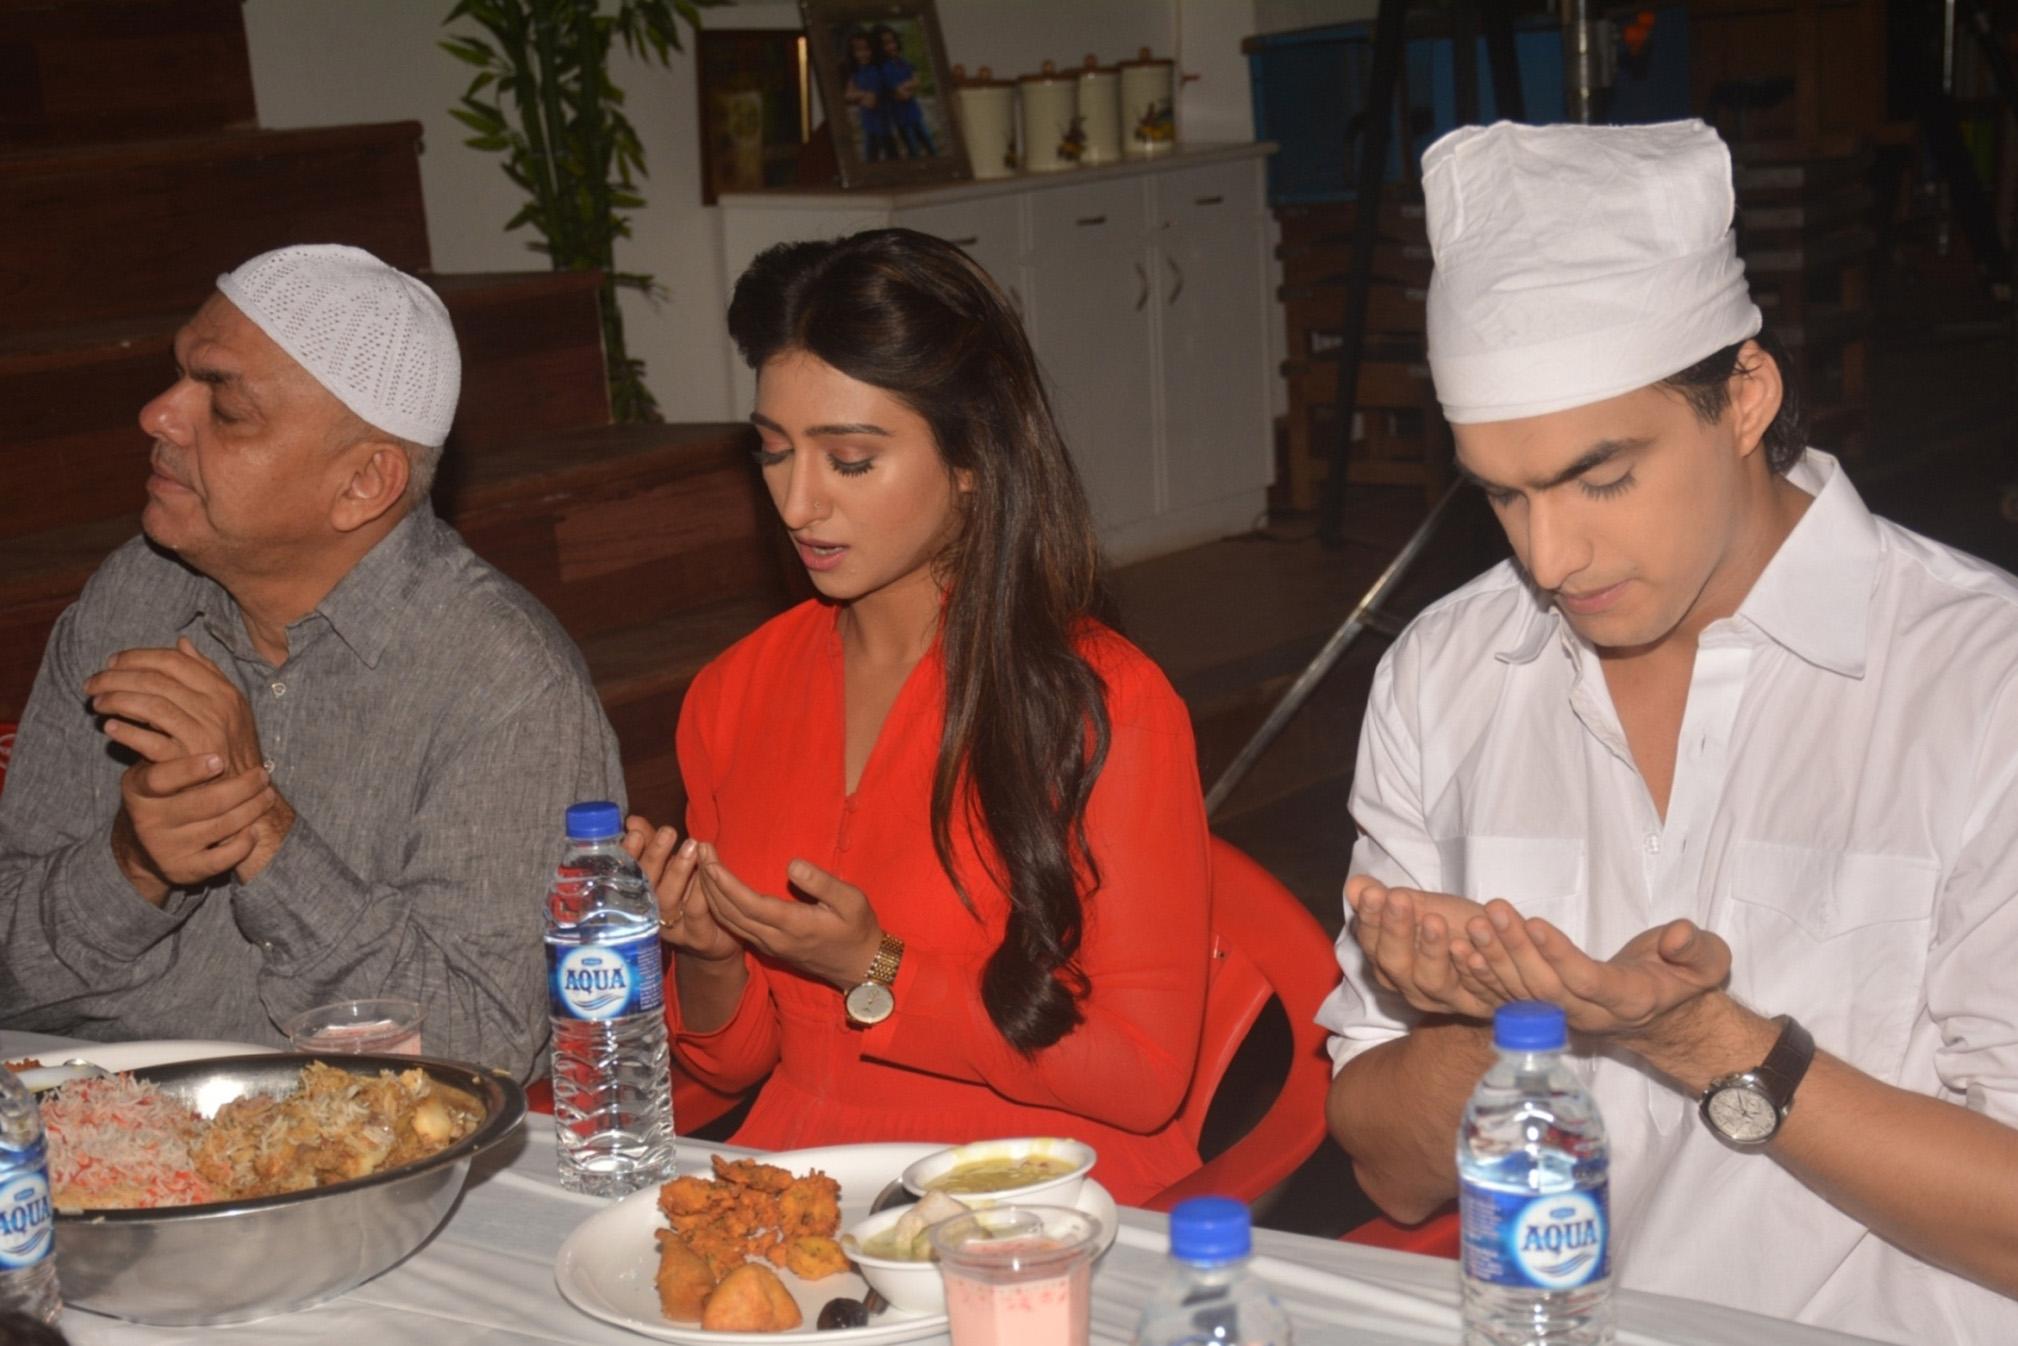 yeh rishta kya kehlata hai cast at iftar party